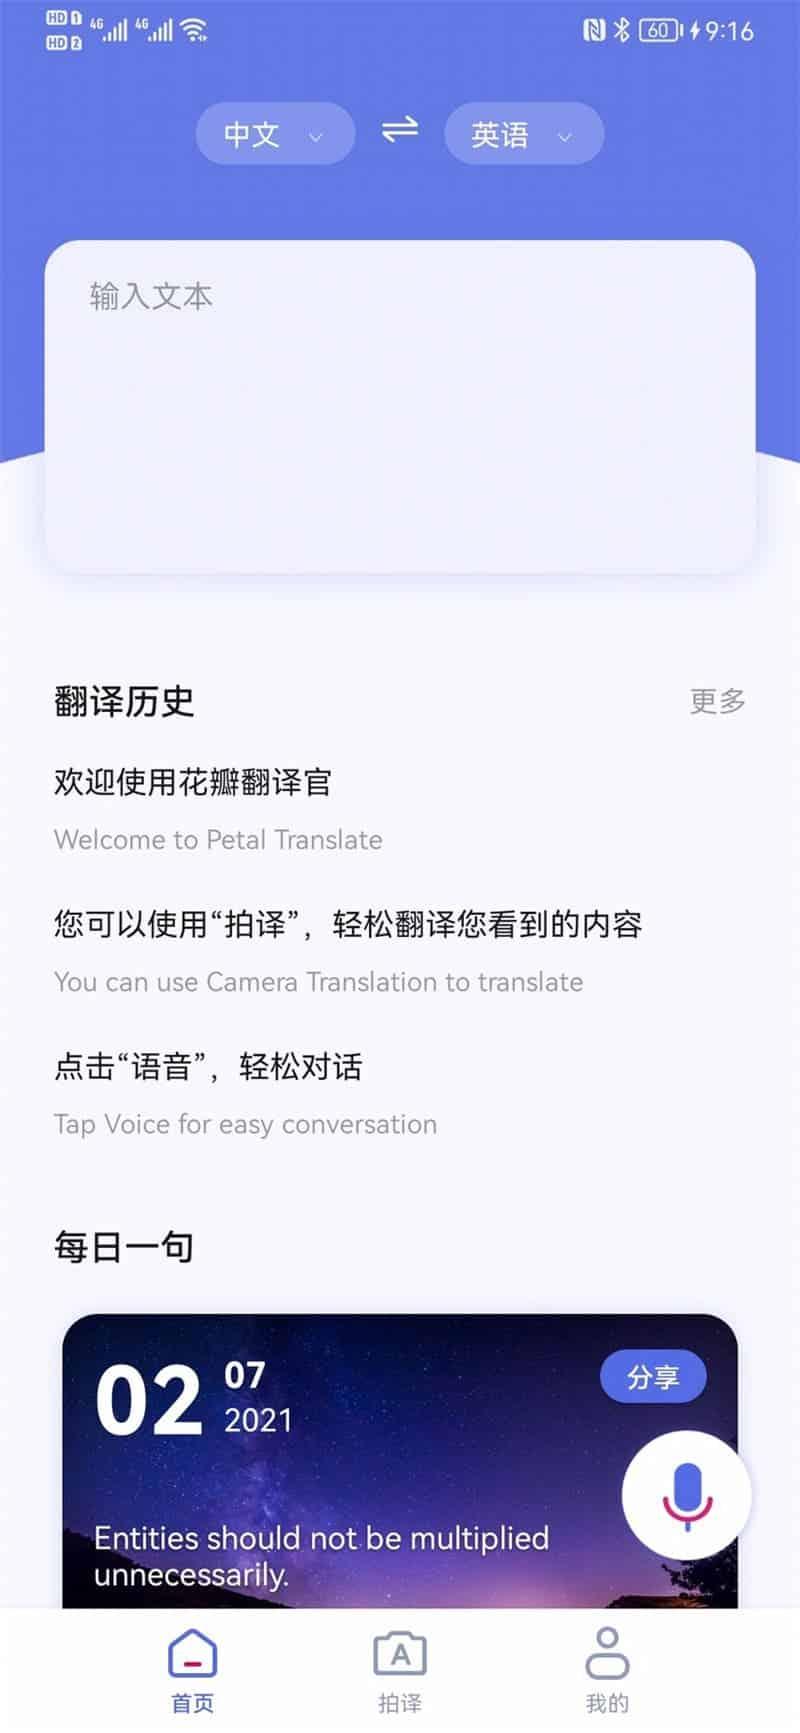 Huawei Petal Translator App